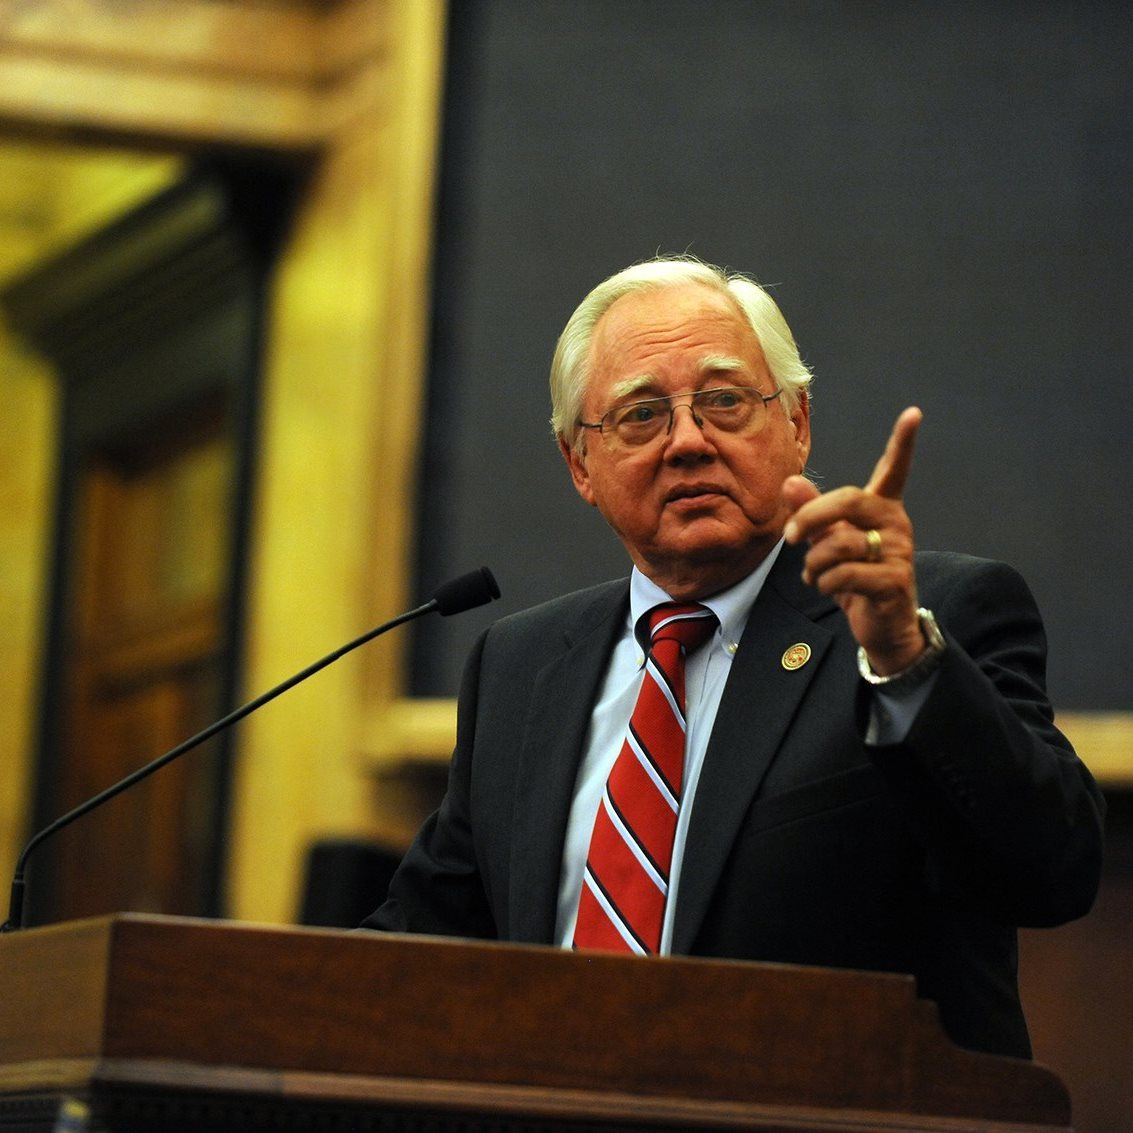 Rep. John Read recaps the 2020 legislative session